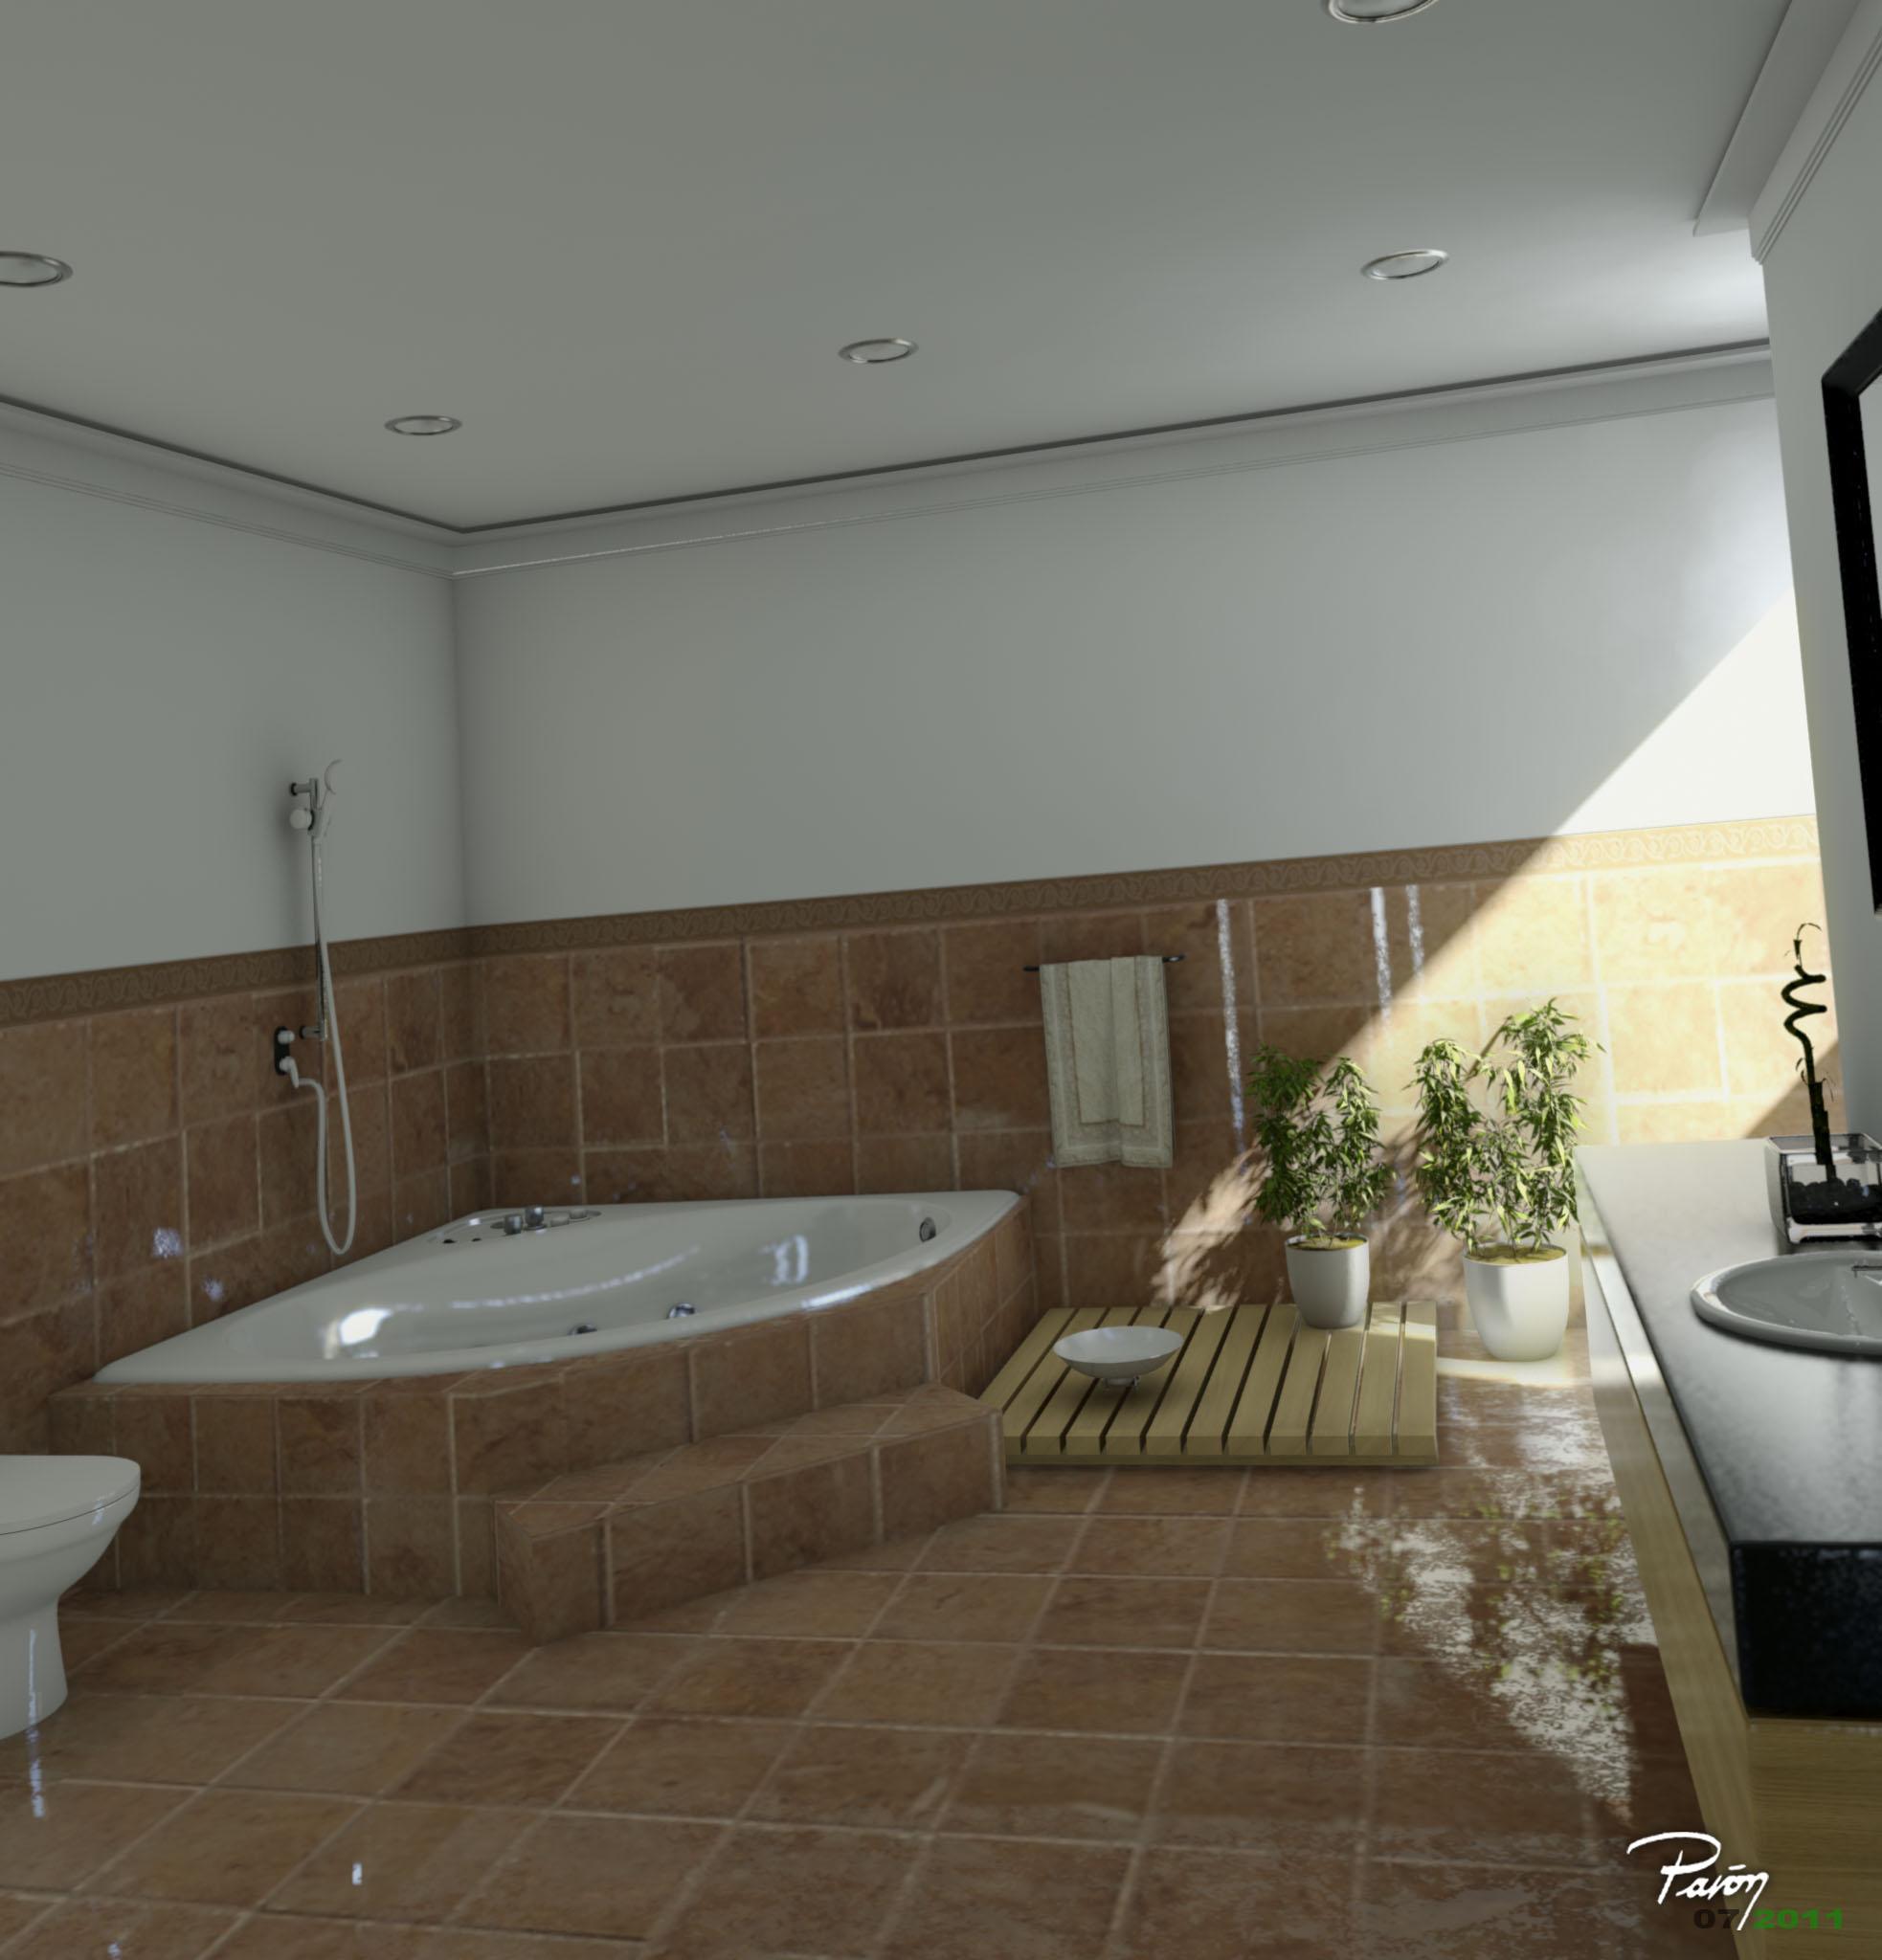 Imagenes De Baño En Tina:Tina de baño-bath-room2jpg